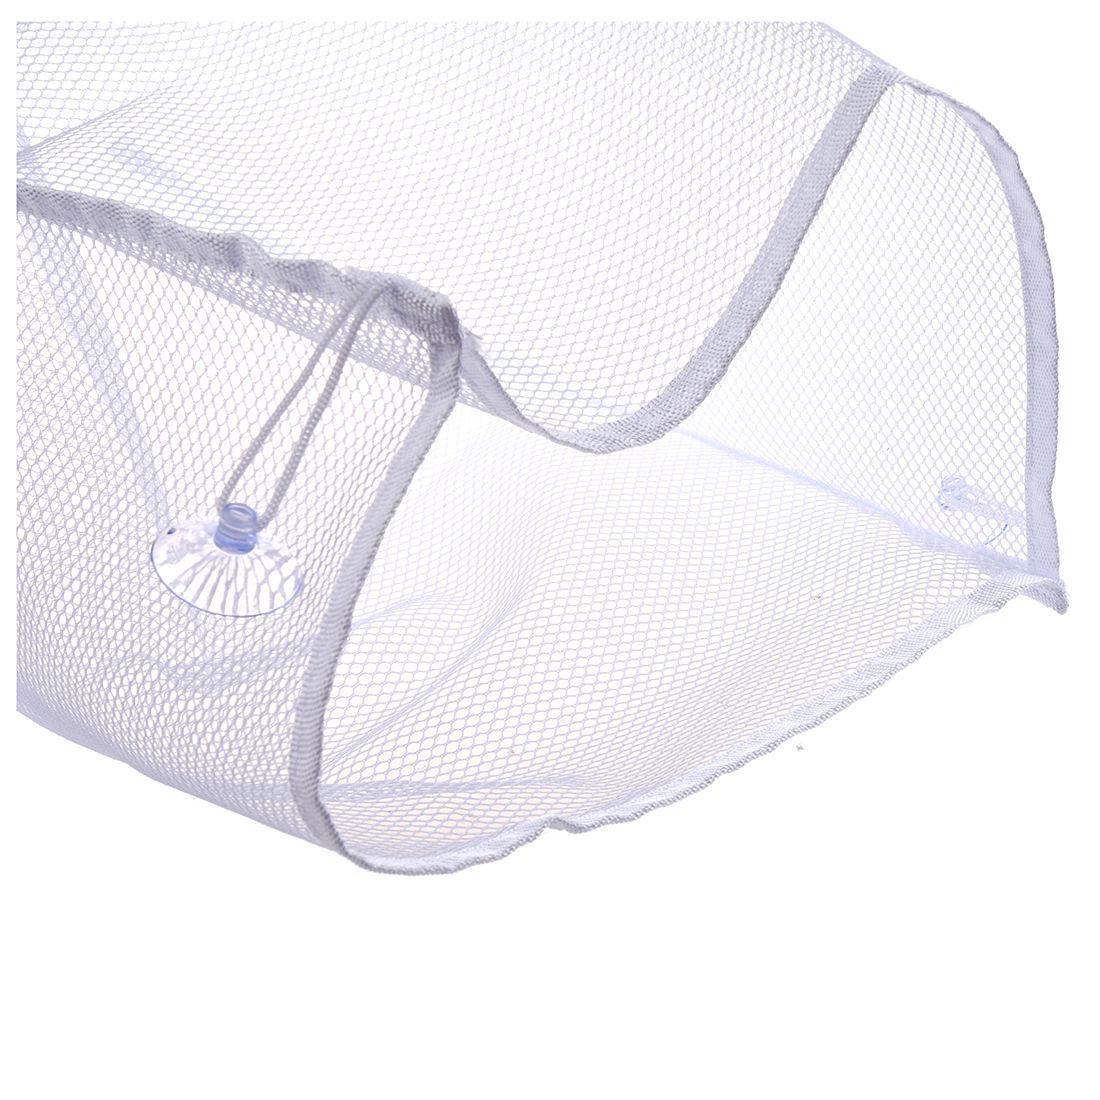 HGHO-Creative Folding Eco-Friendly 37X37cm Kids Baby Bathroom Mesh ...